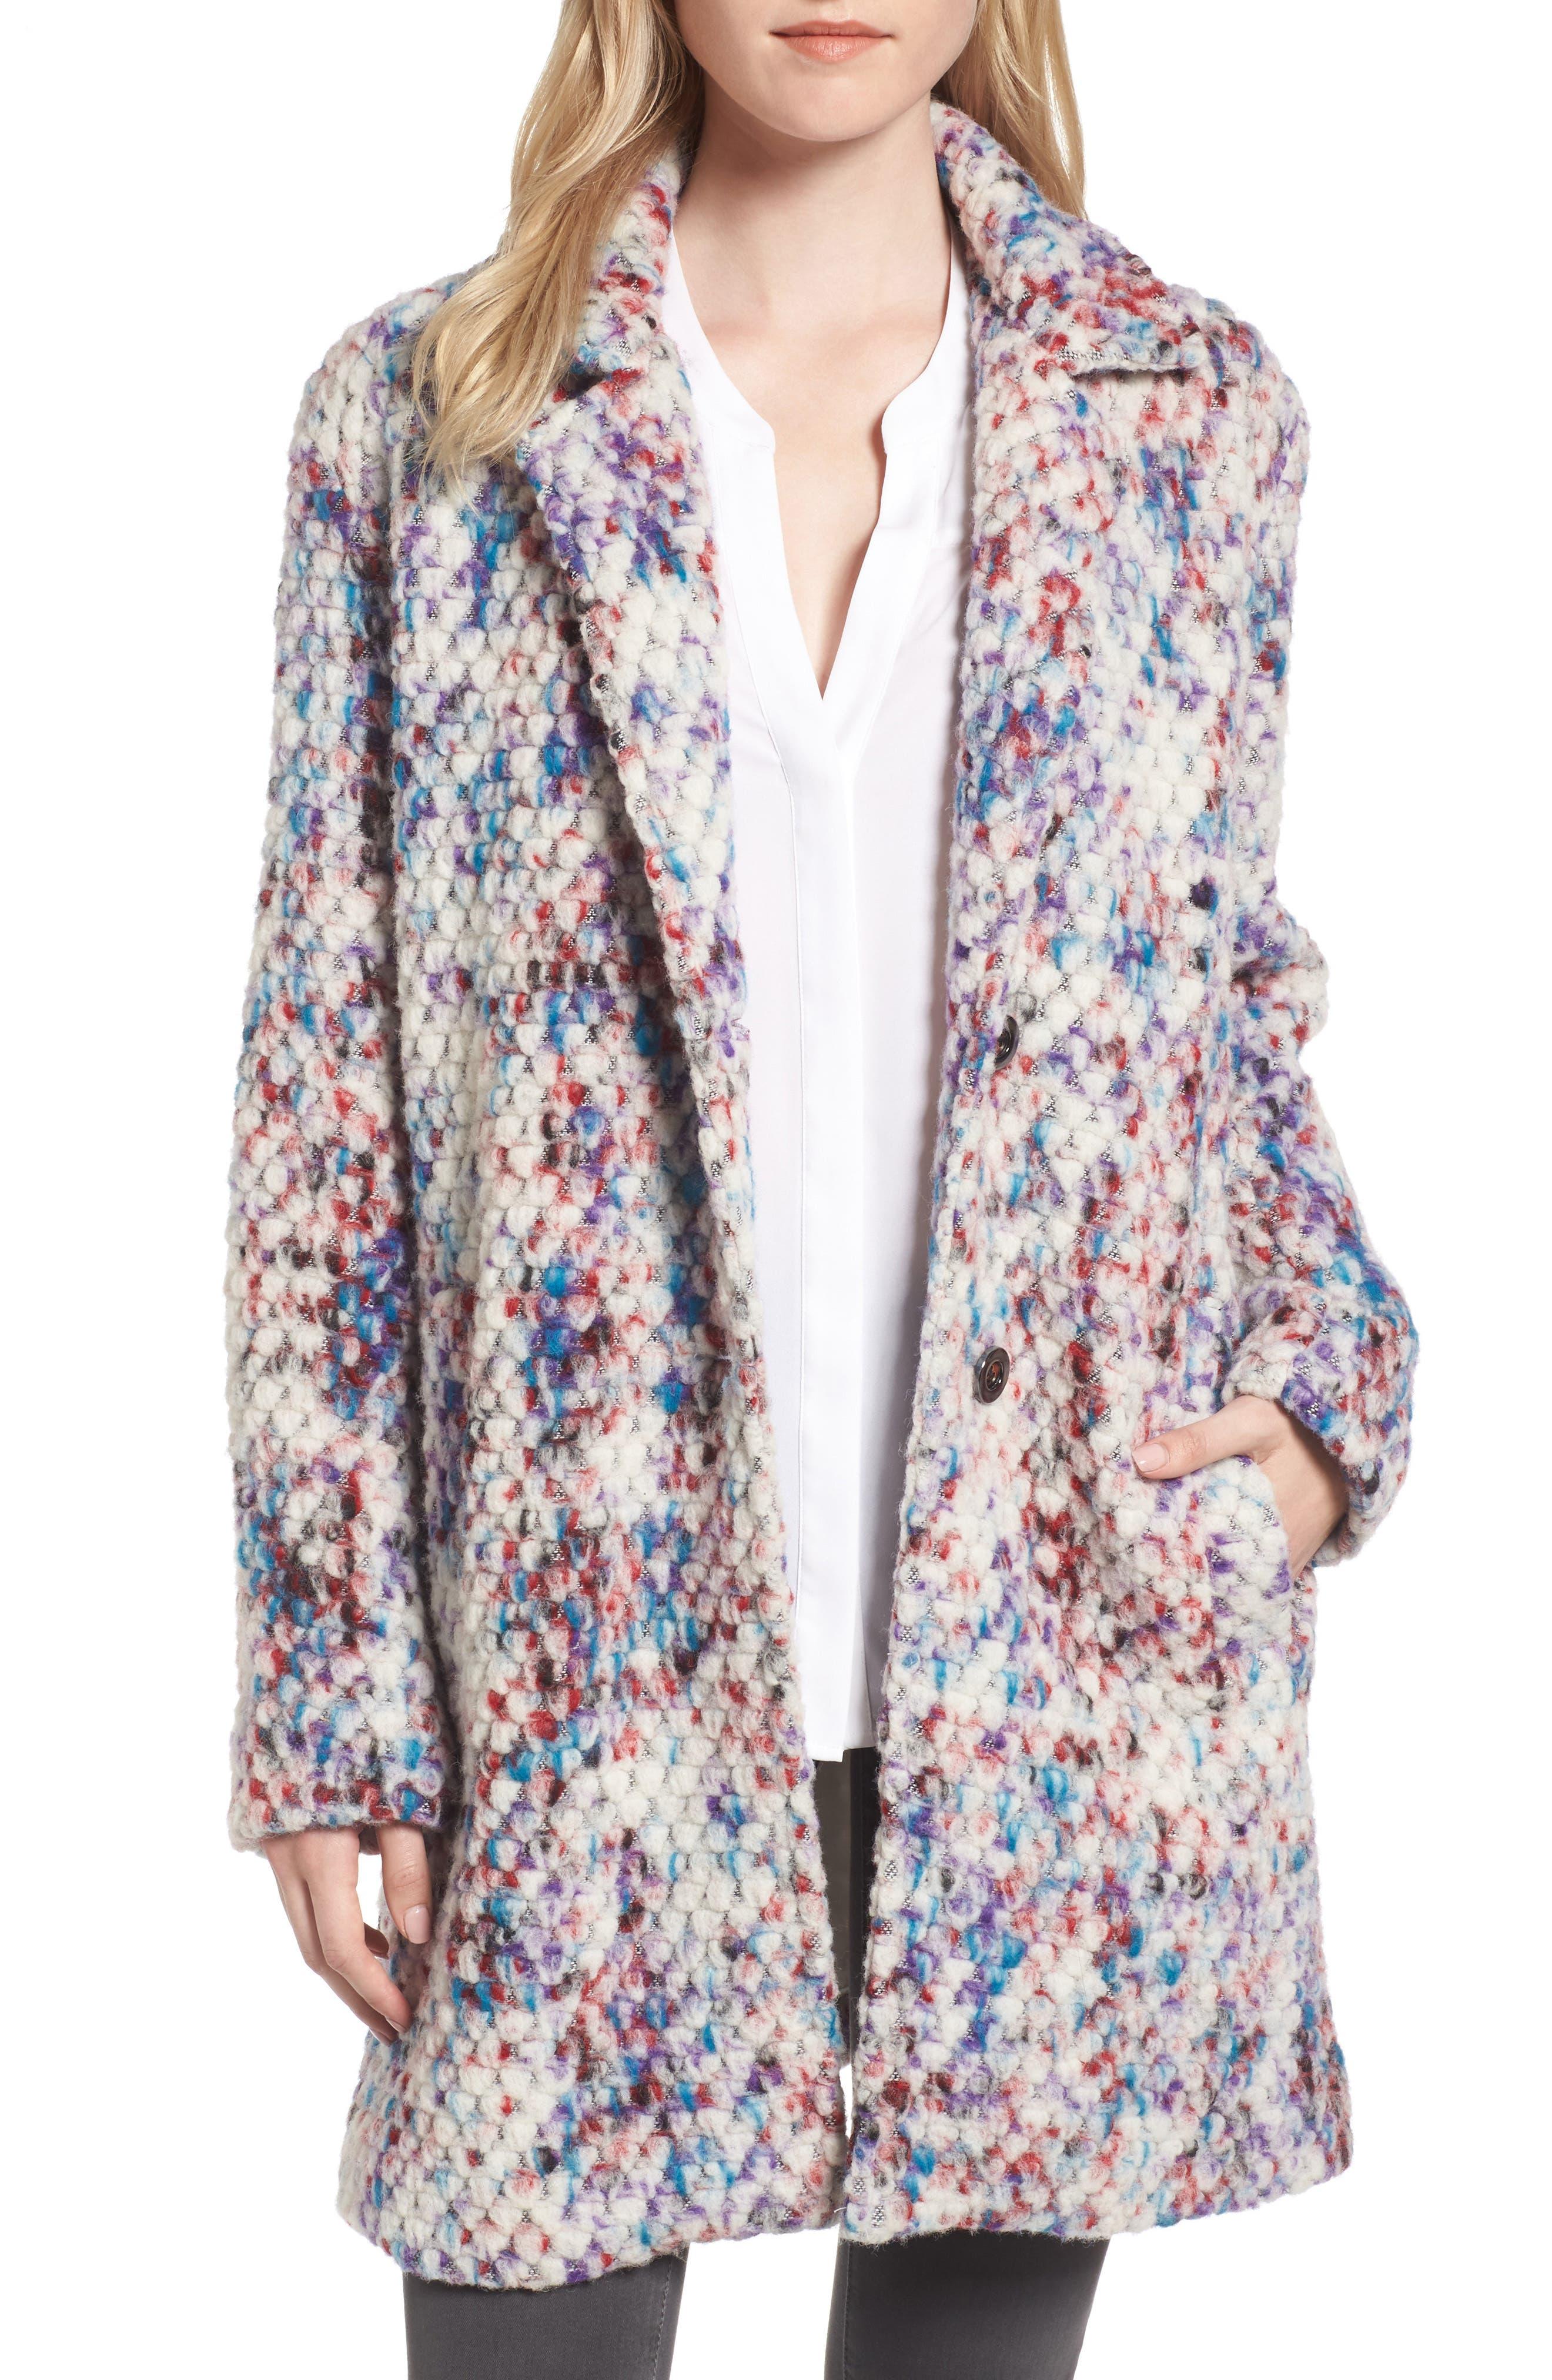 Confetti Wool Blend Coat,                             Main thumbnail 1, color,                             560